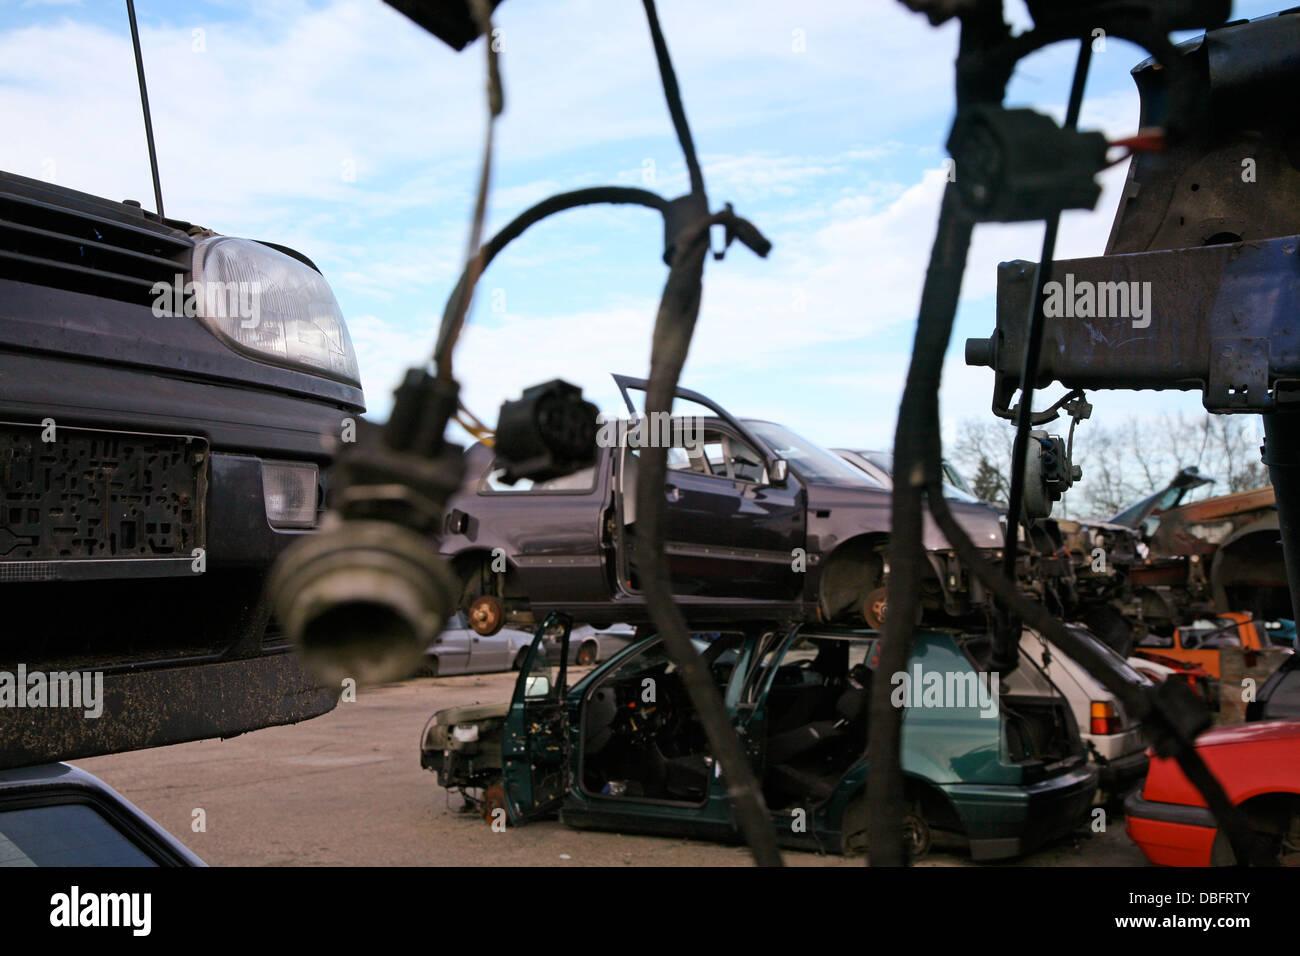 schrottplatz stockfoto, bild: 58740331 - alamy